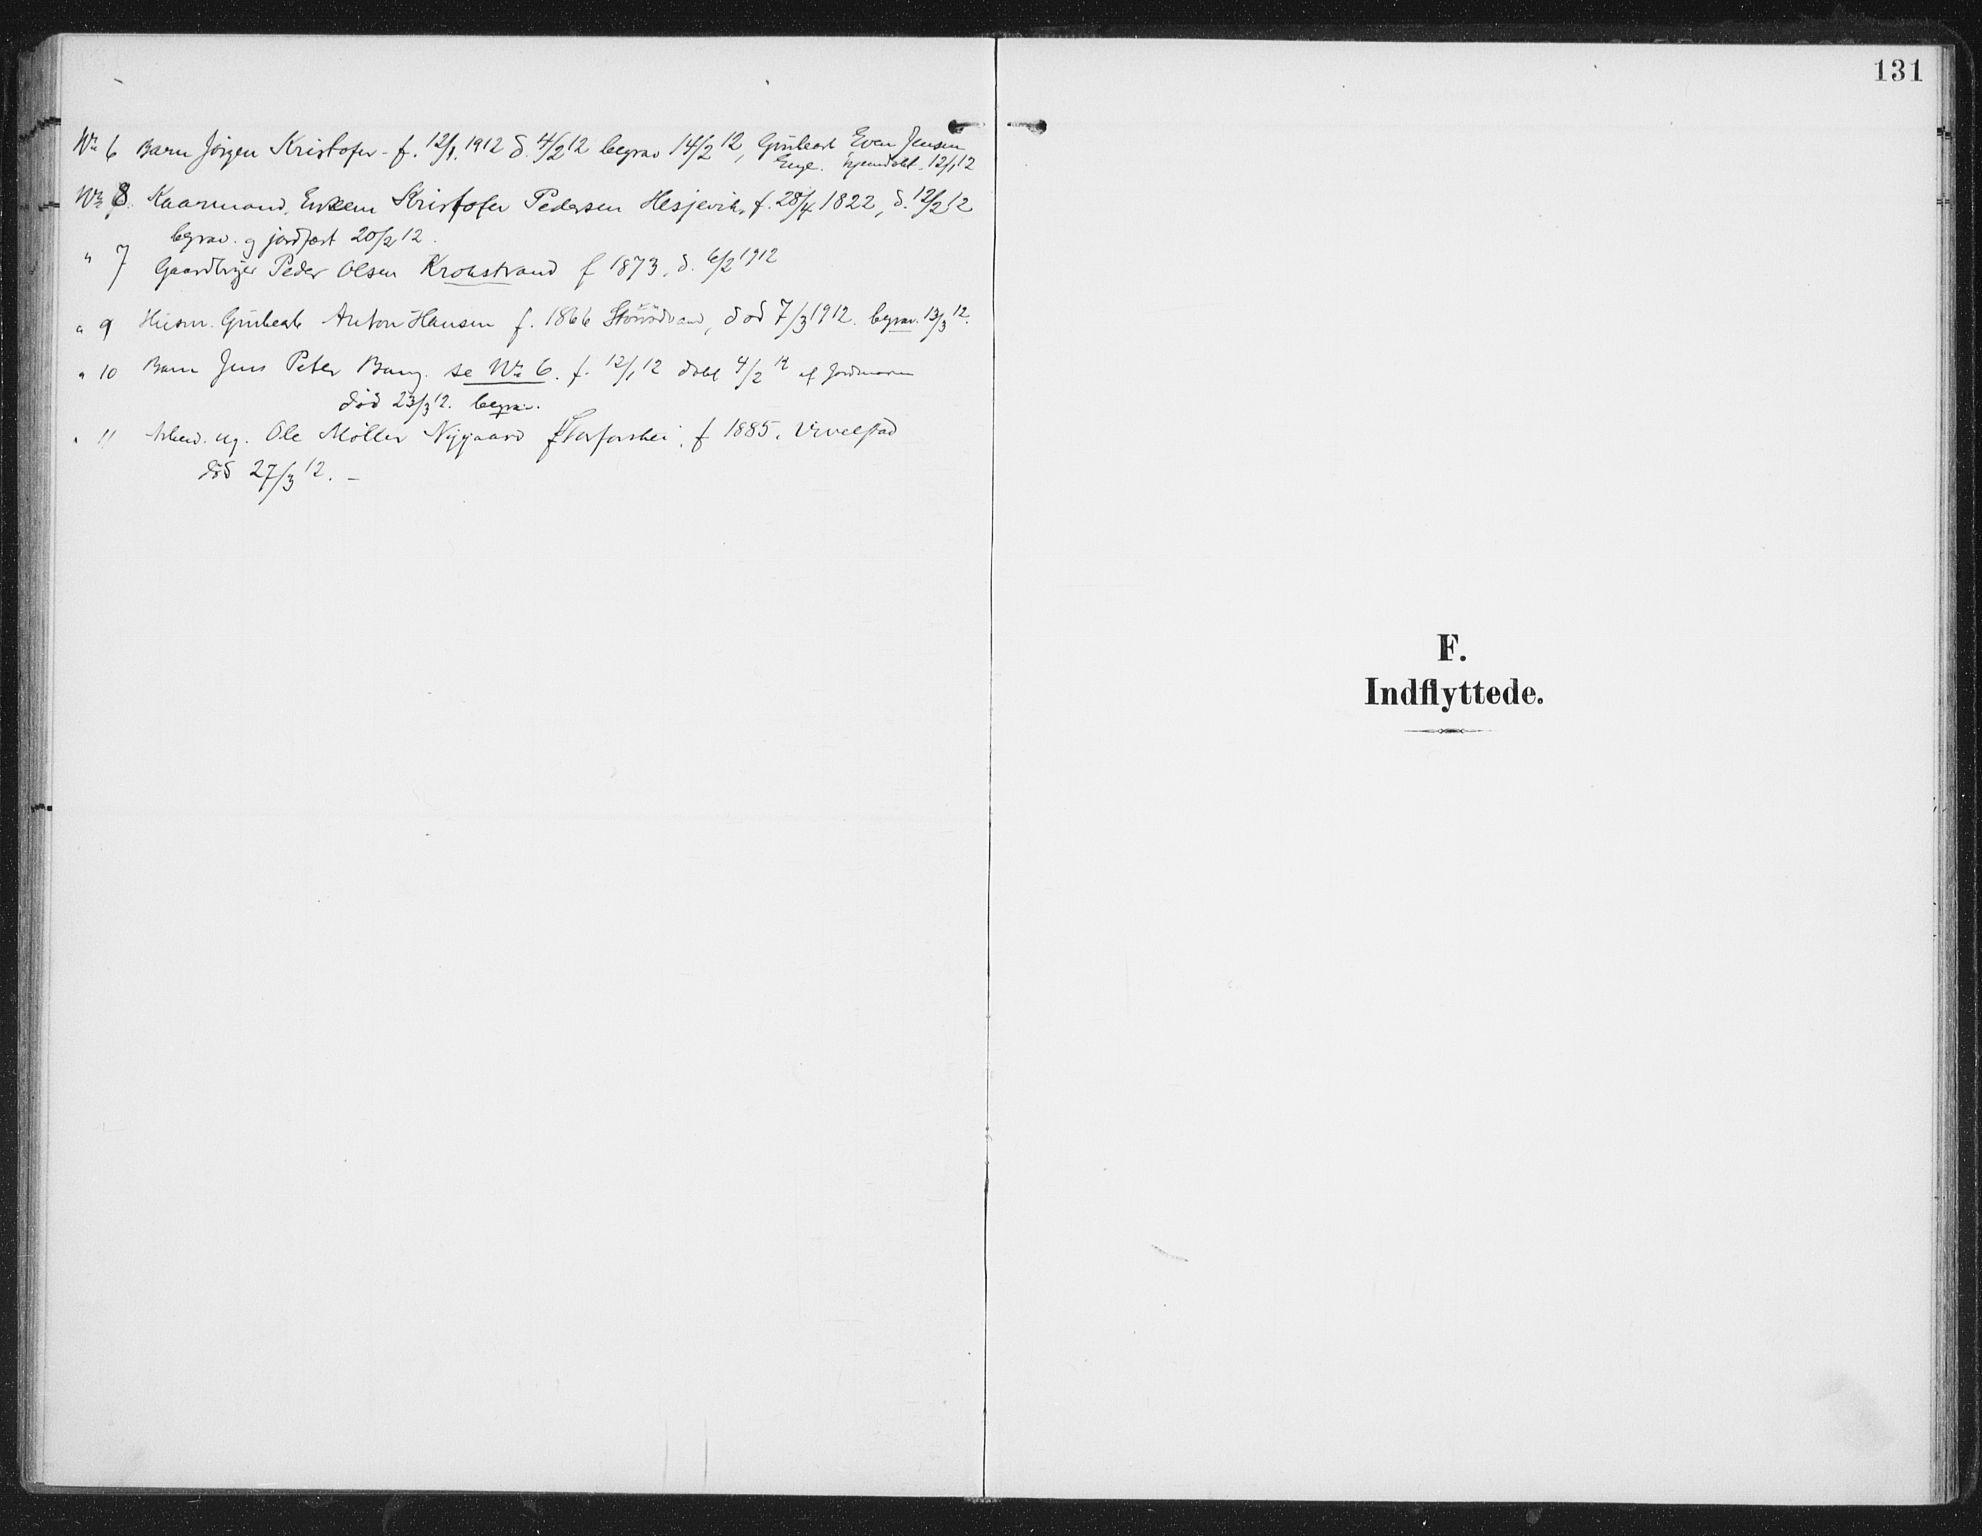 SAT, Ministerialprotokoller, klokkerbøker og fødselsregistre - Nordland, 827/L0403: Ministerialbok nr. 827A15, 1903-1912, s. 131